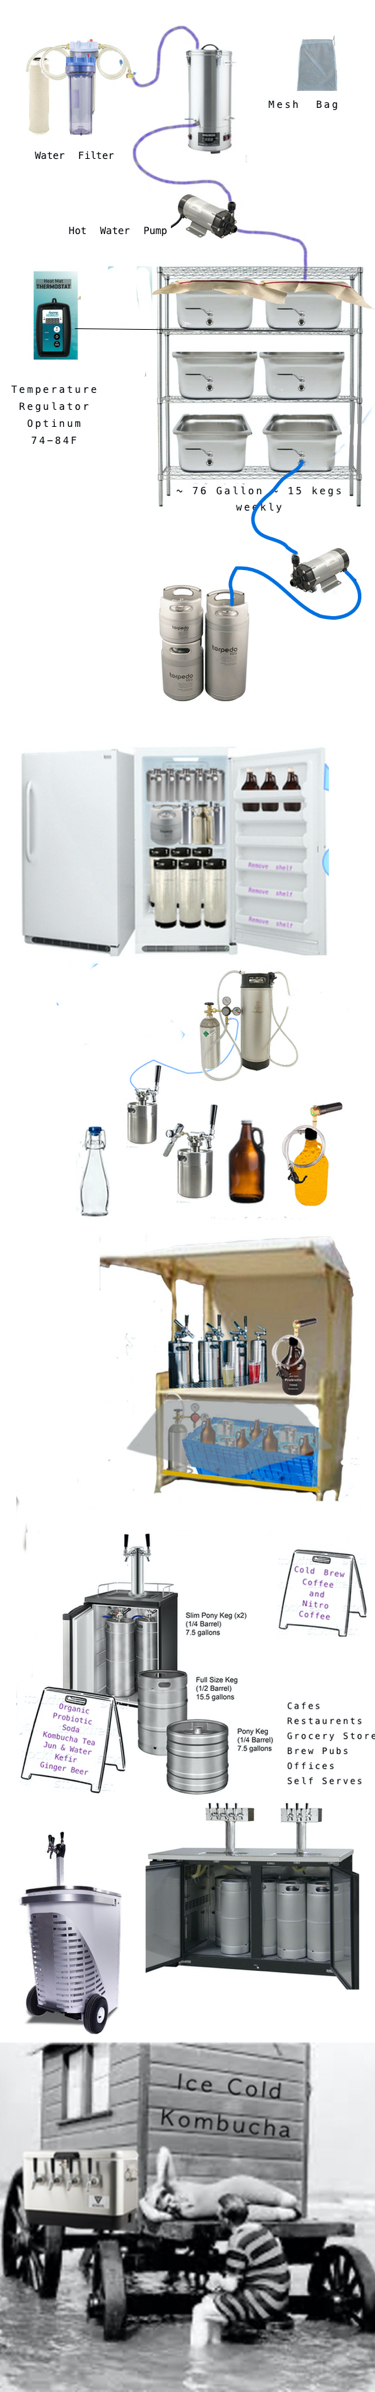 happyherbalist-anatomy-of-a-kombucha-micro-brewery.jpg